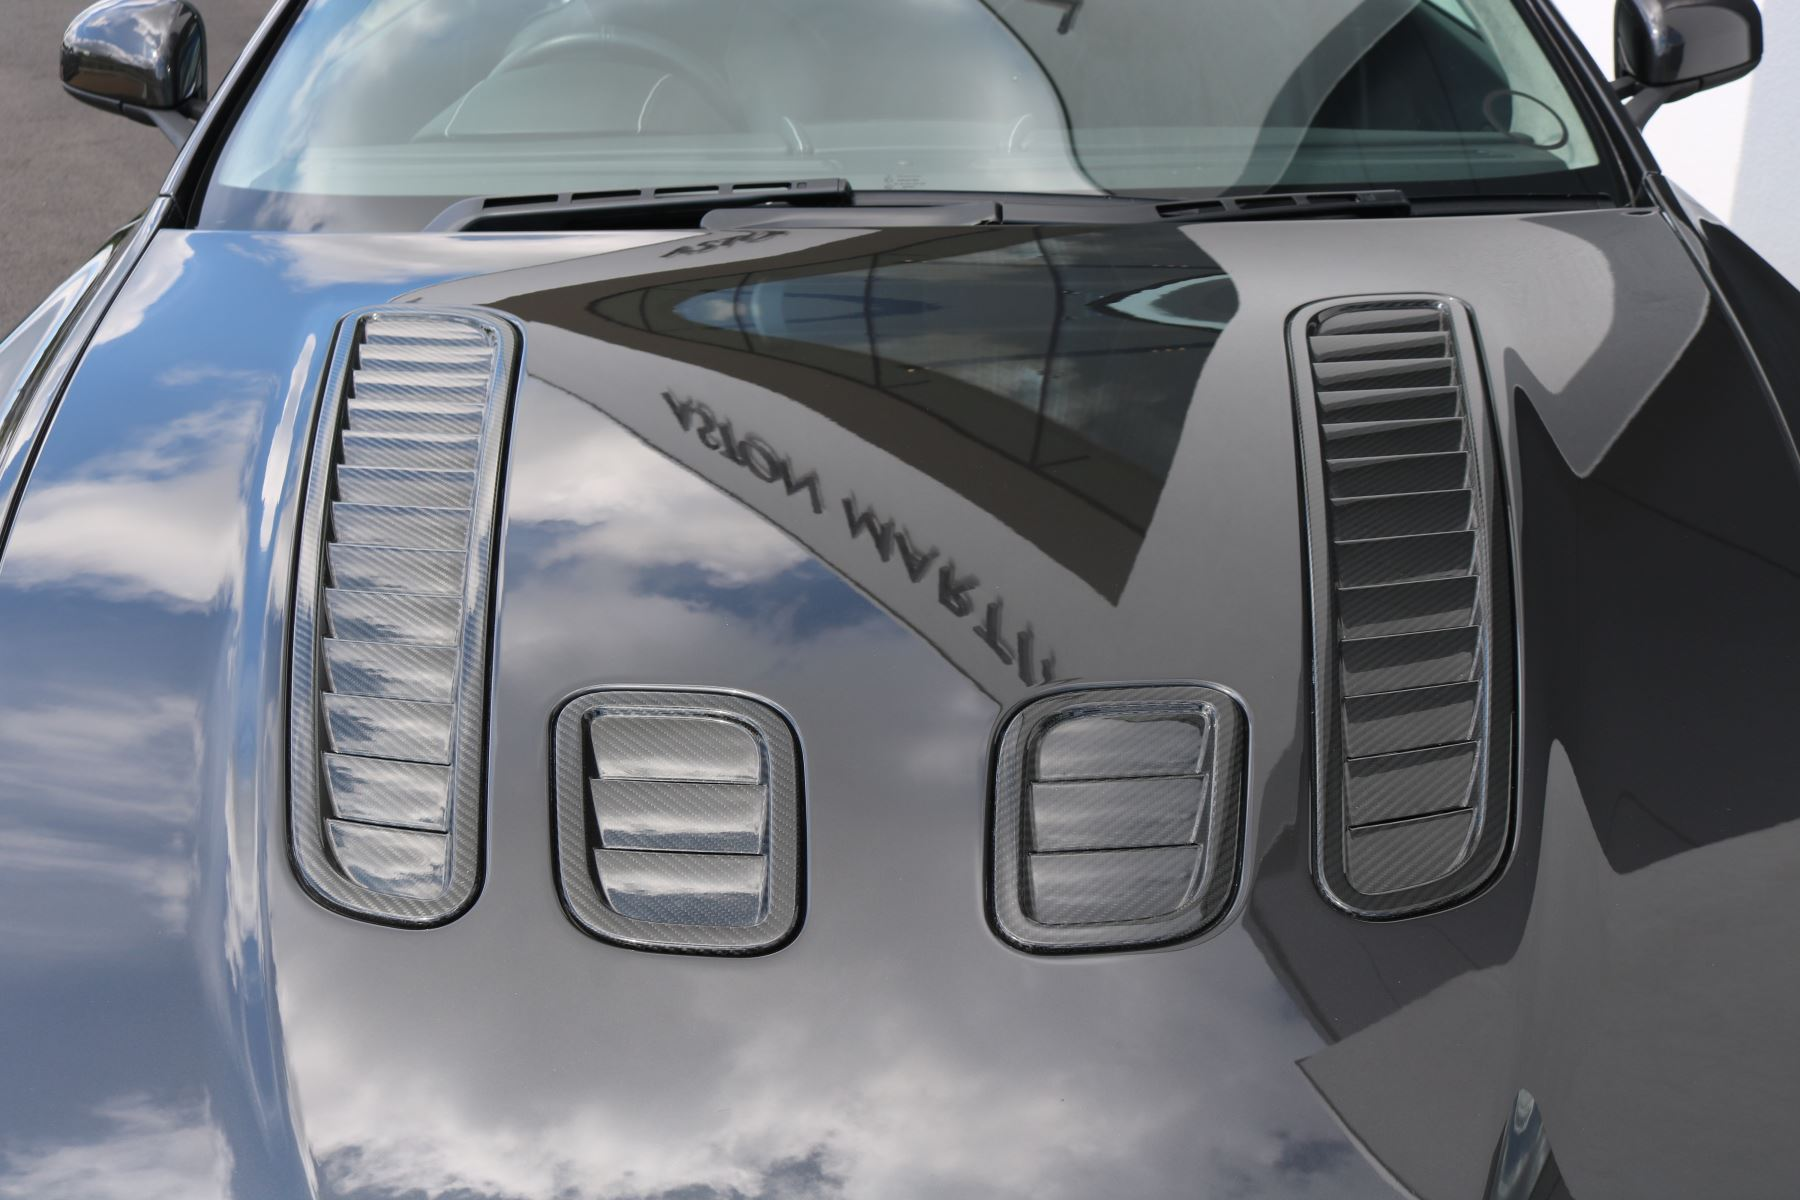 Aston Martin V12 Vantage 2dr image 11